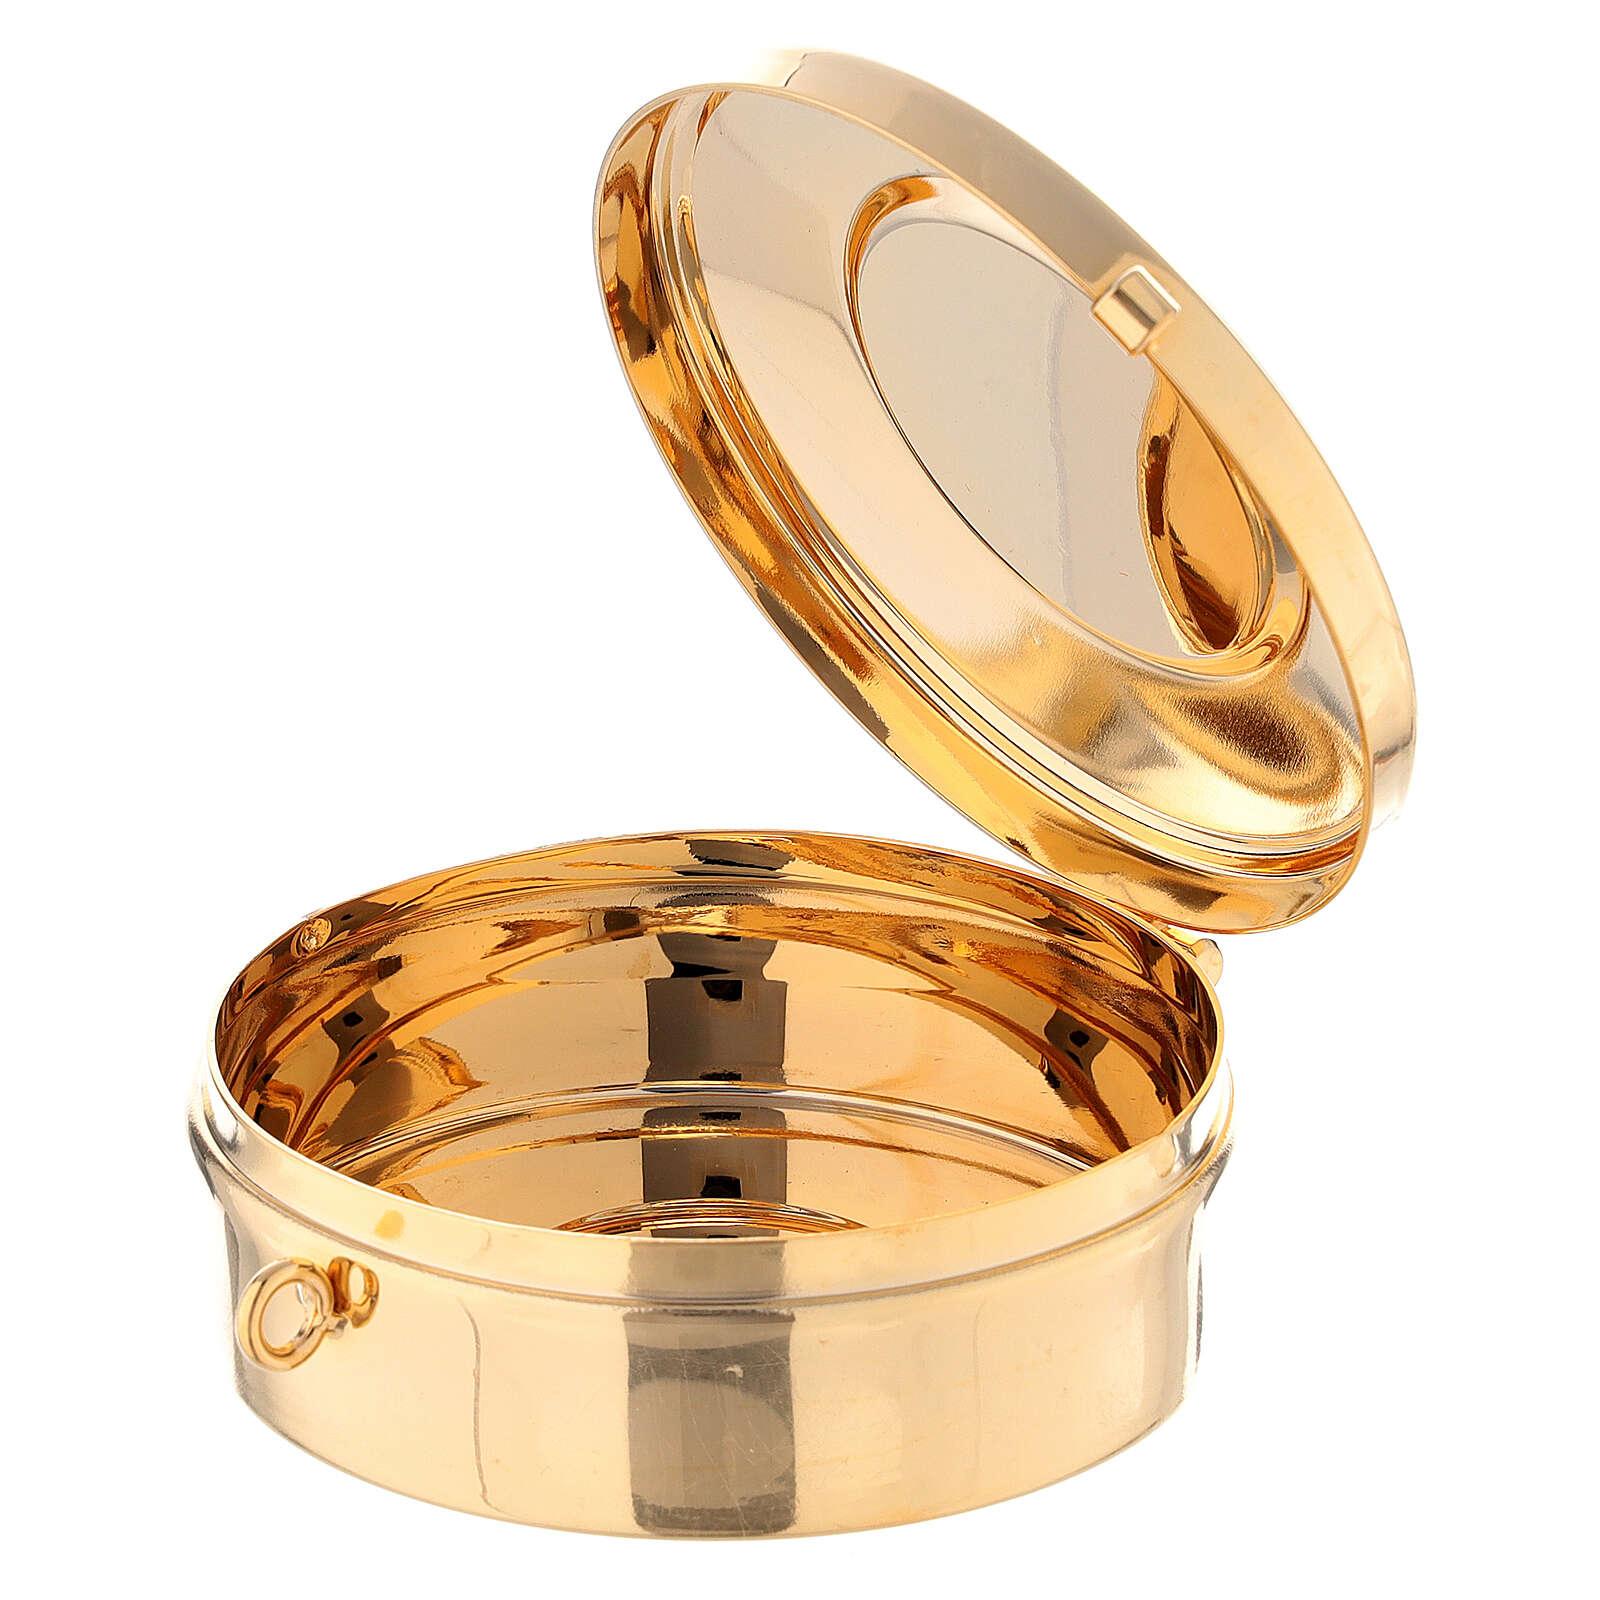 Estuche adamascado de jacquard dorado con cuerda para relicario d. 7,5 cm 3